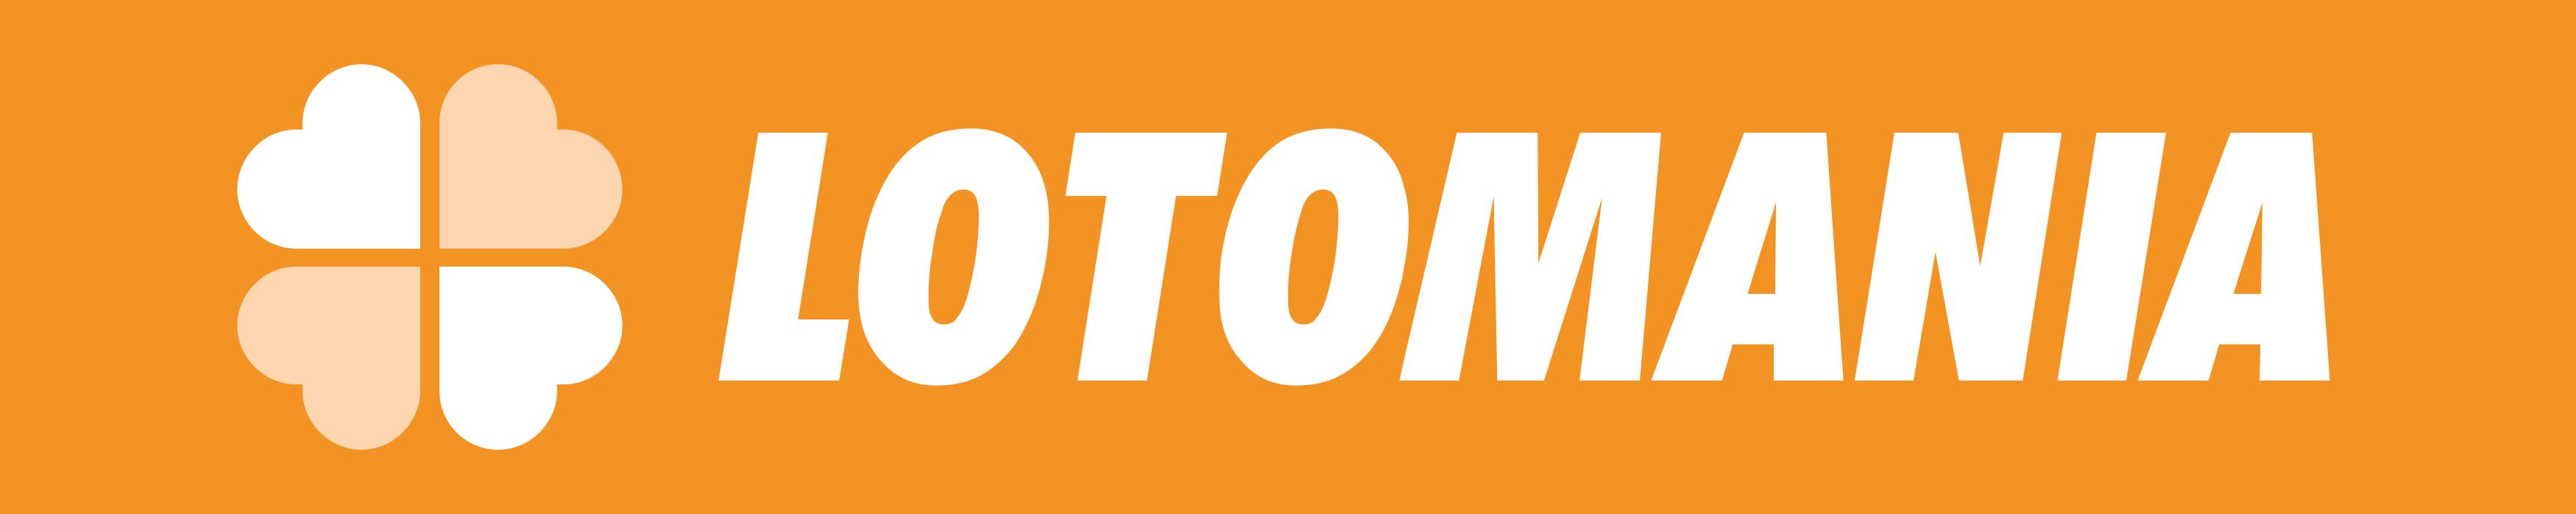 Lotomania Logo.